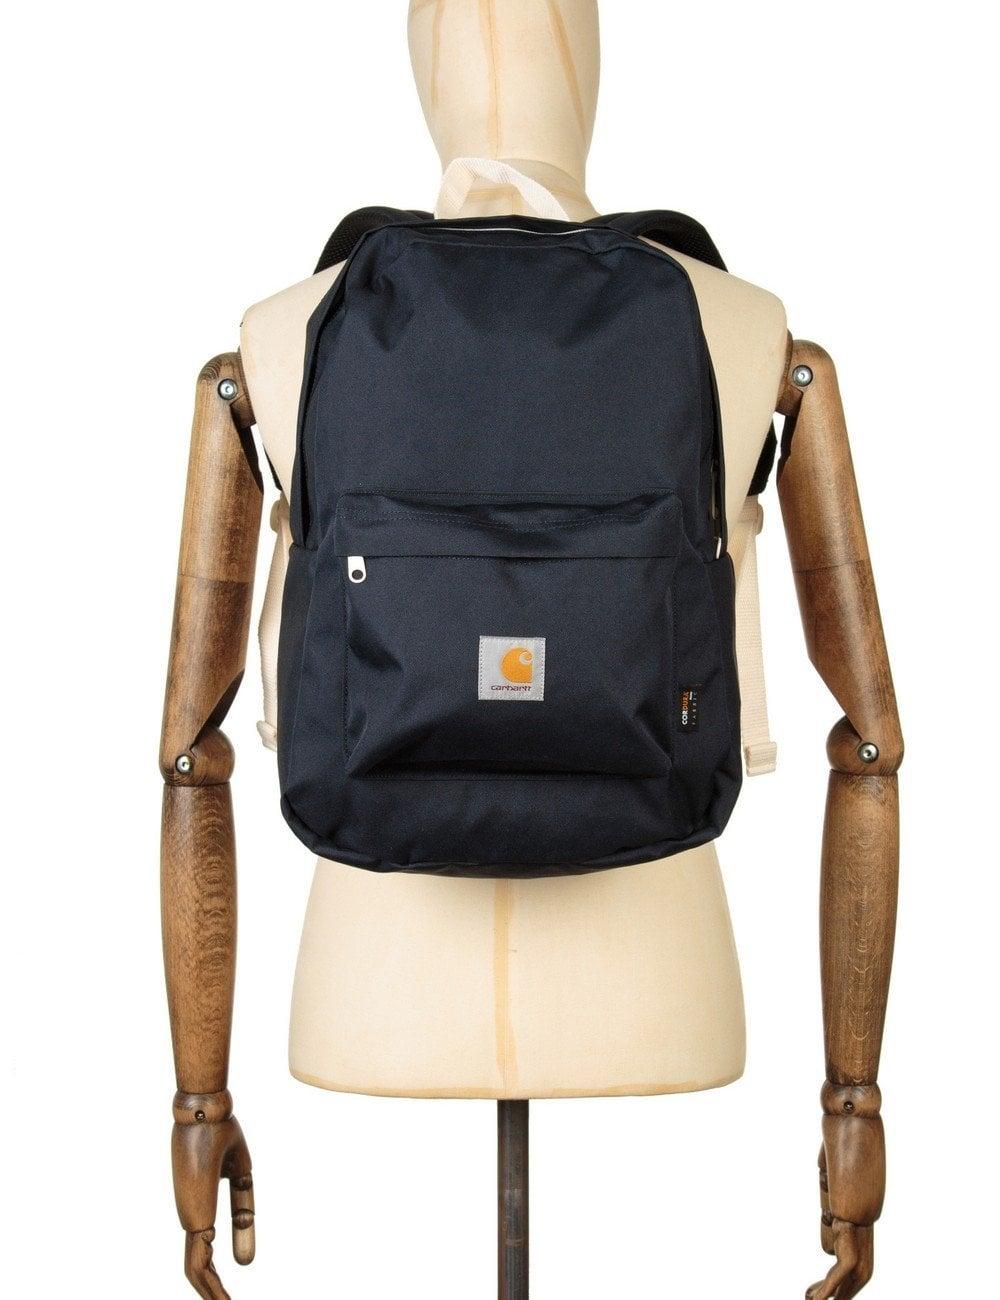 Carhartt WIP Watch Backpack - Dark Navy - Accessories from Fat ...